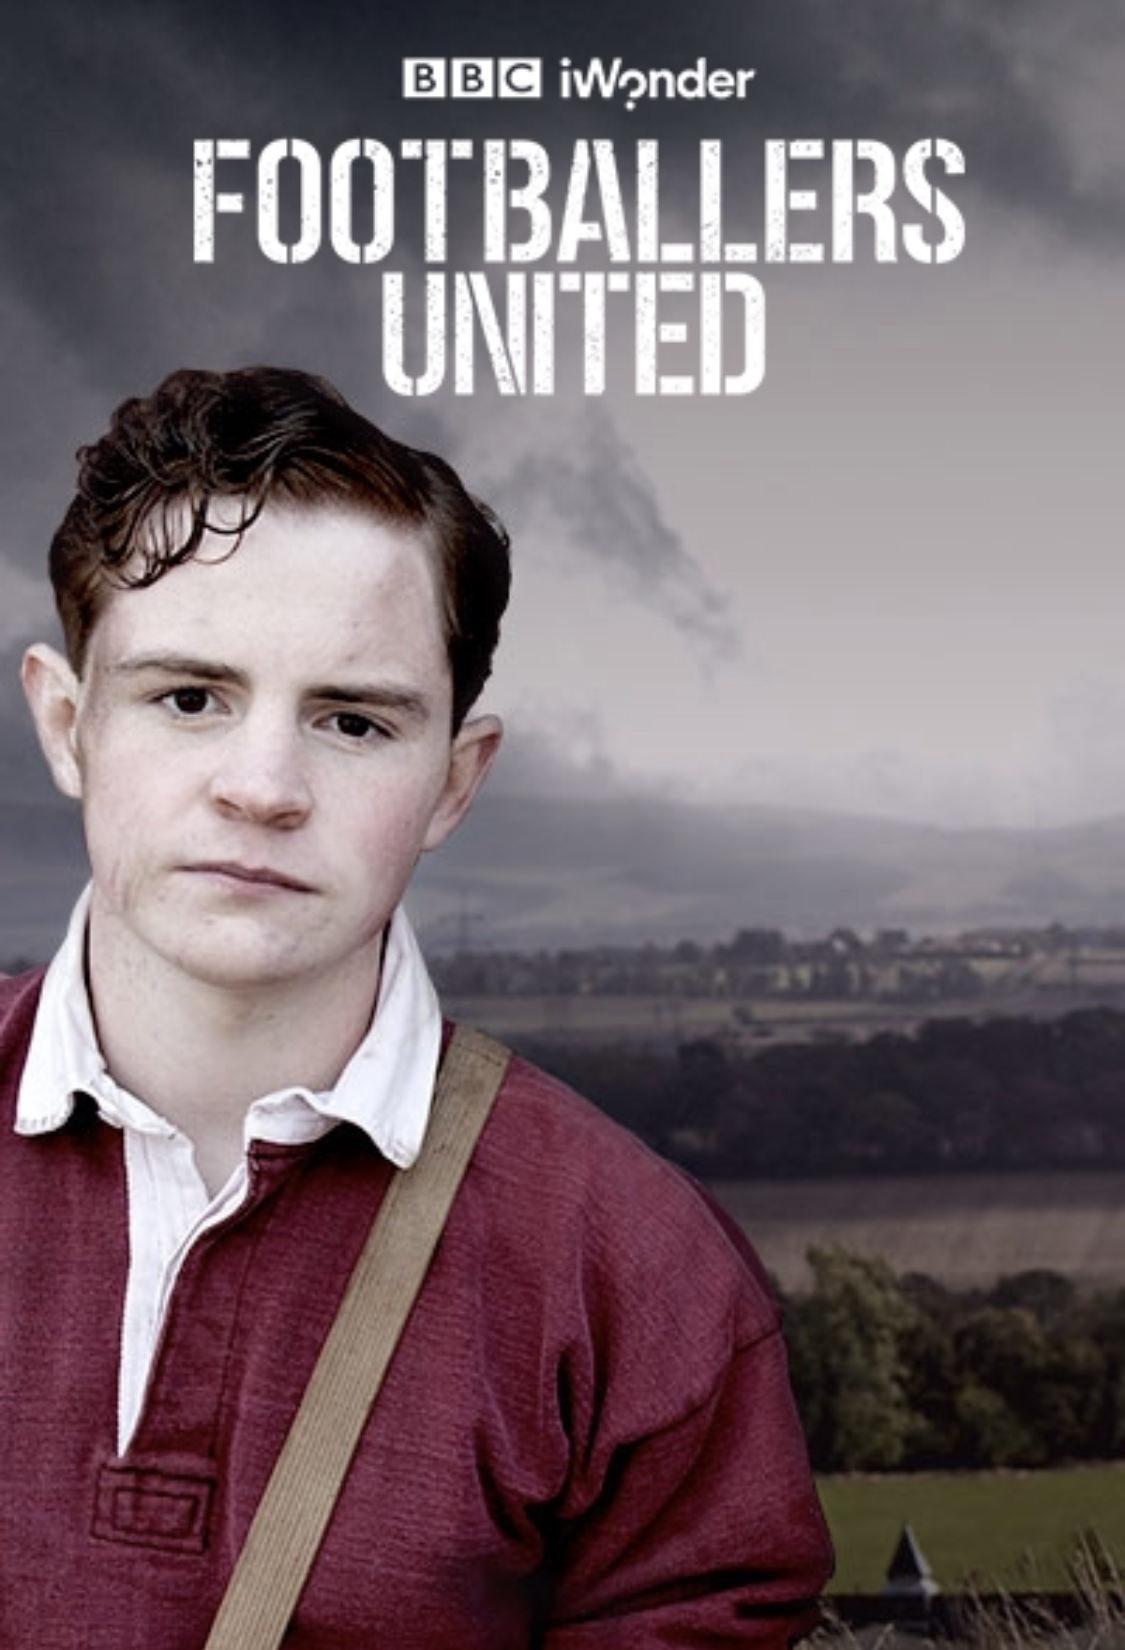 actor-character-headshot-keiran-gallacher-bbc-drama.jpg